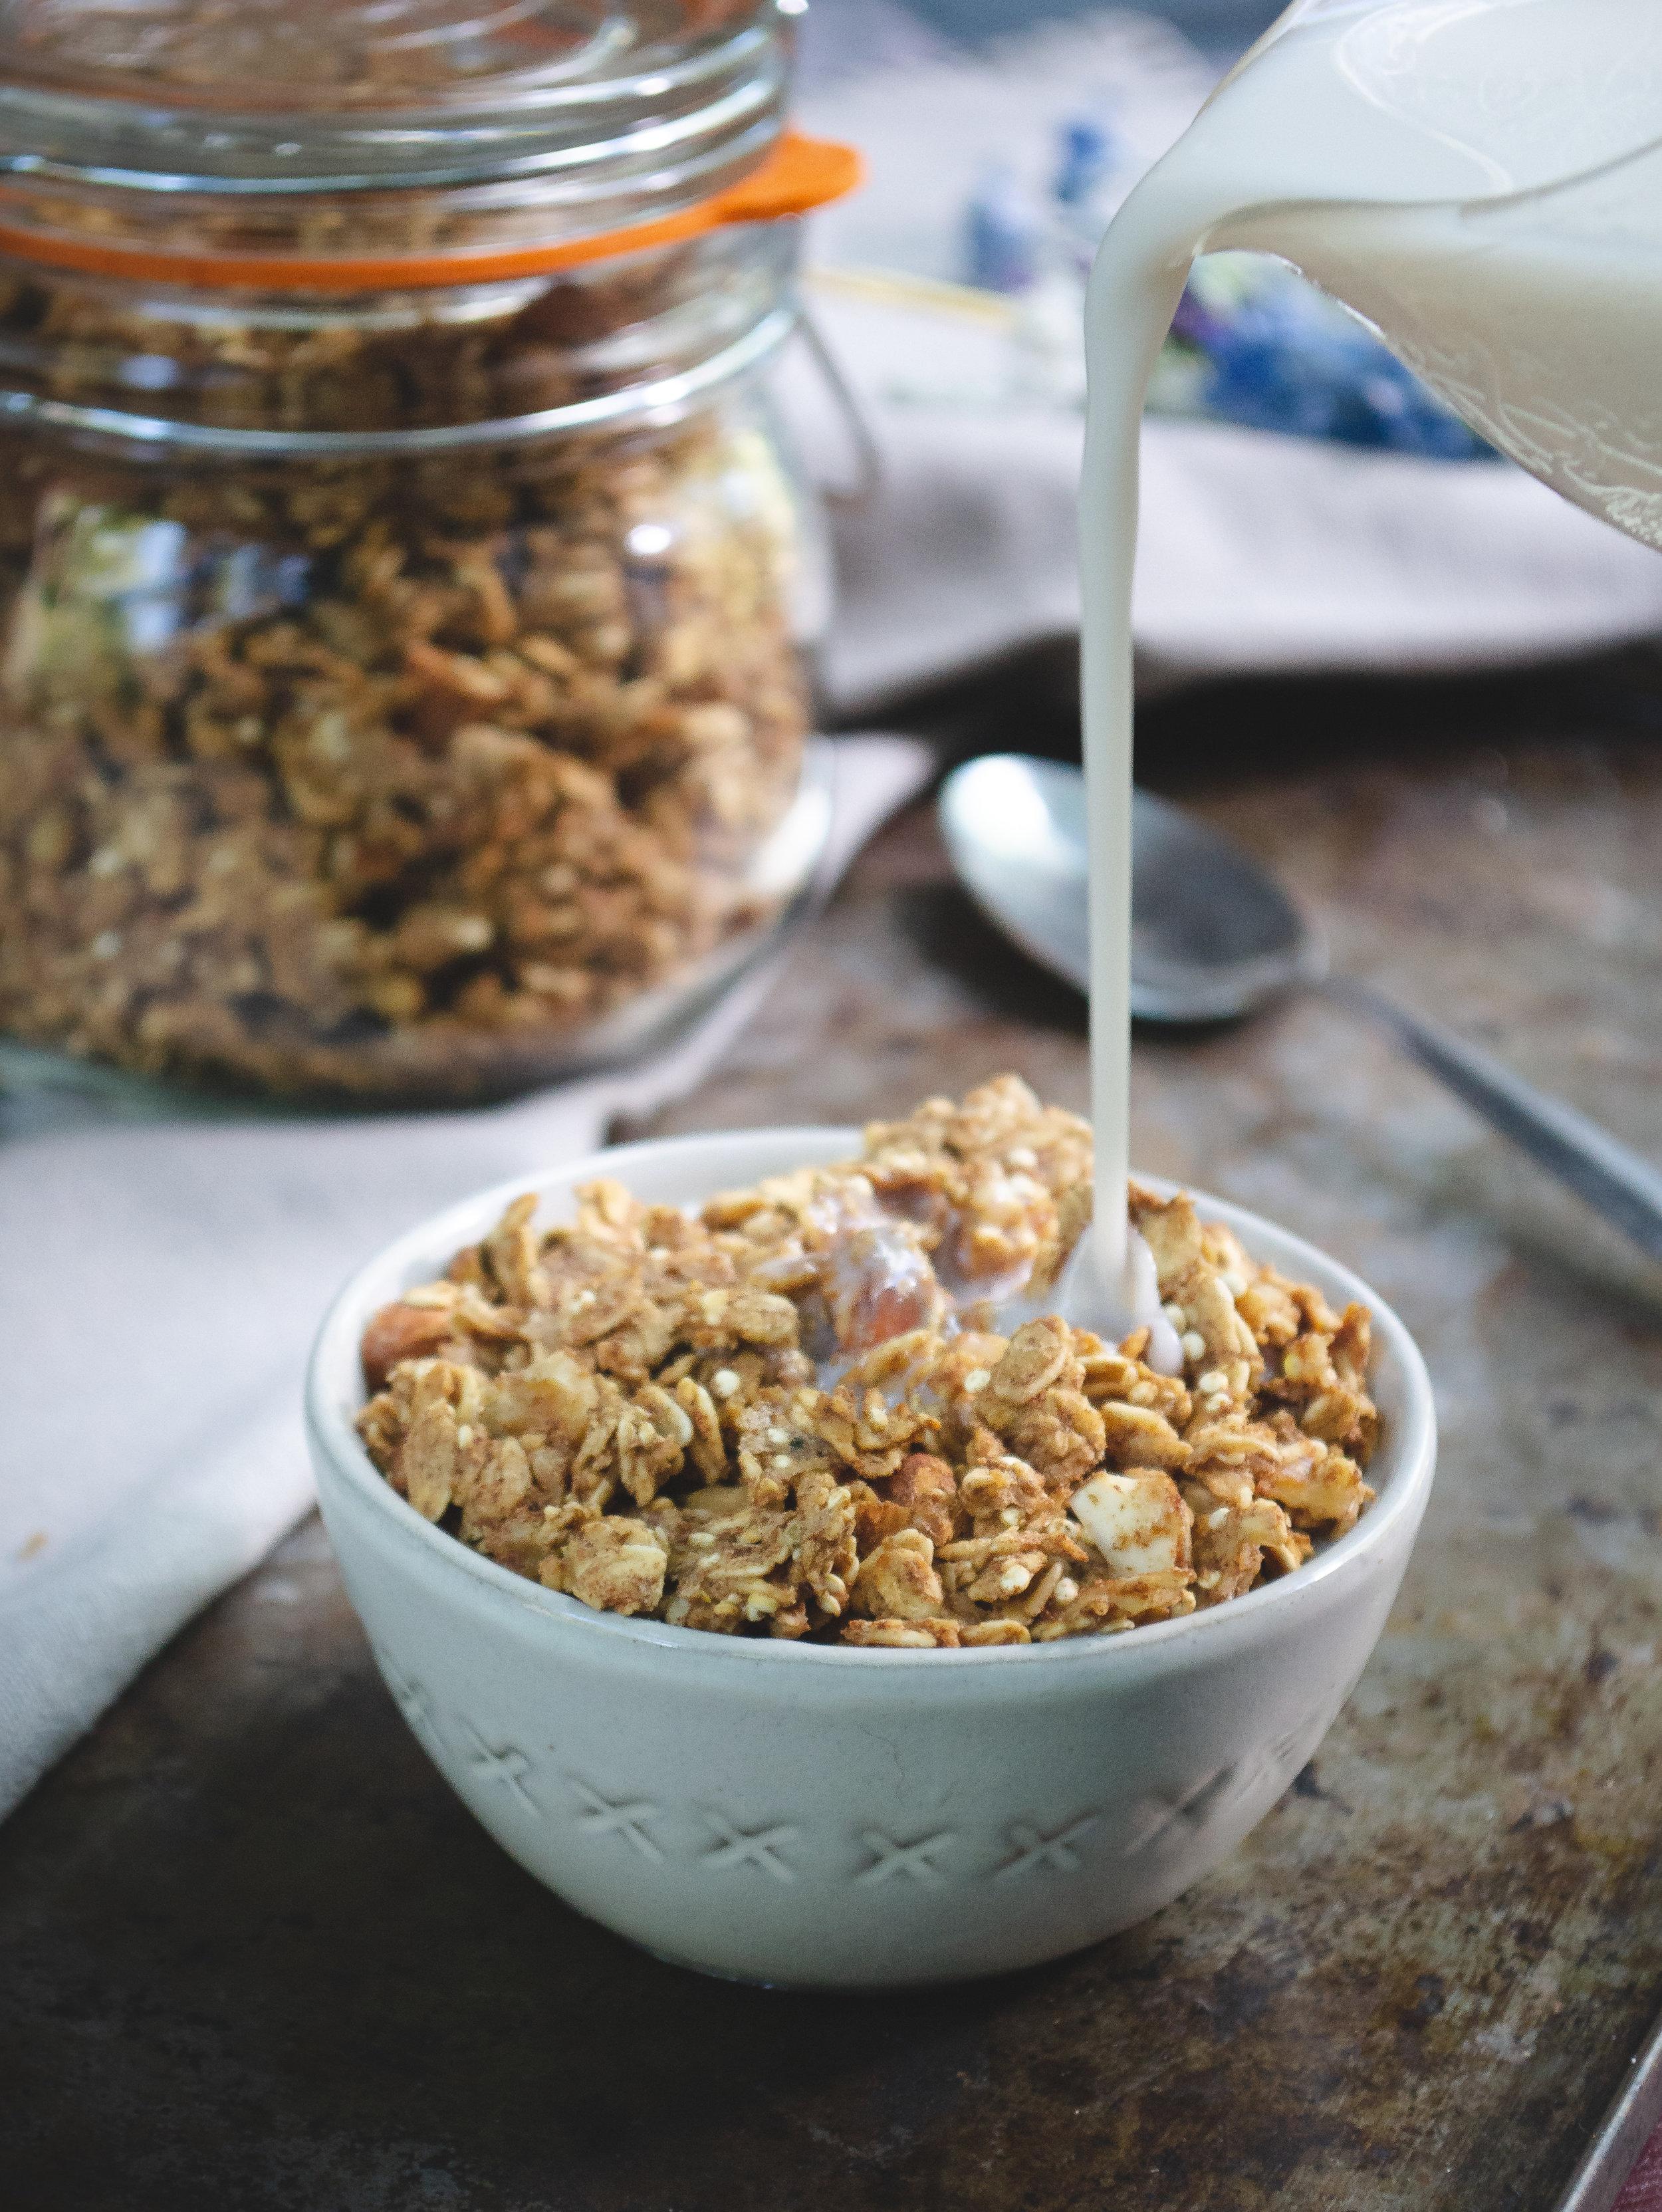 Homemade Cashew Milk Recipe | PICTURED: Granola and homemade cashew milk.  © Elena Hollenhorst